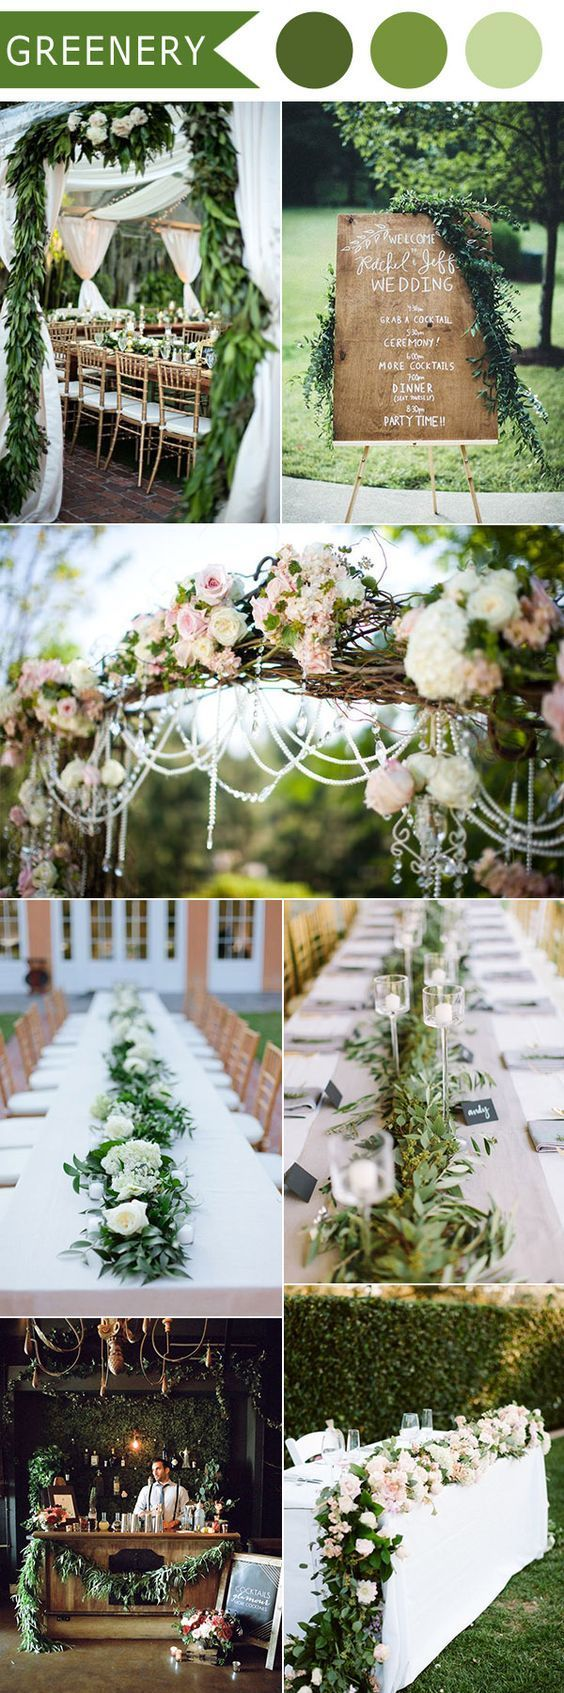 2016 trending greenery natural lush wedding ide